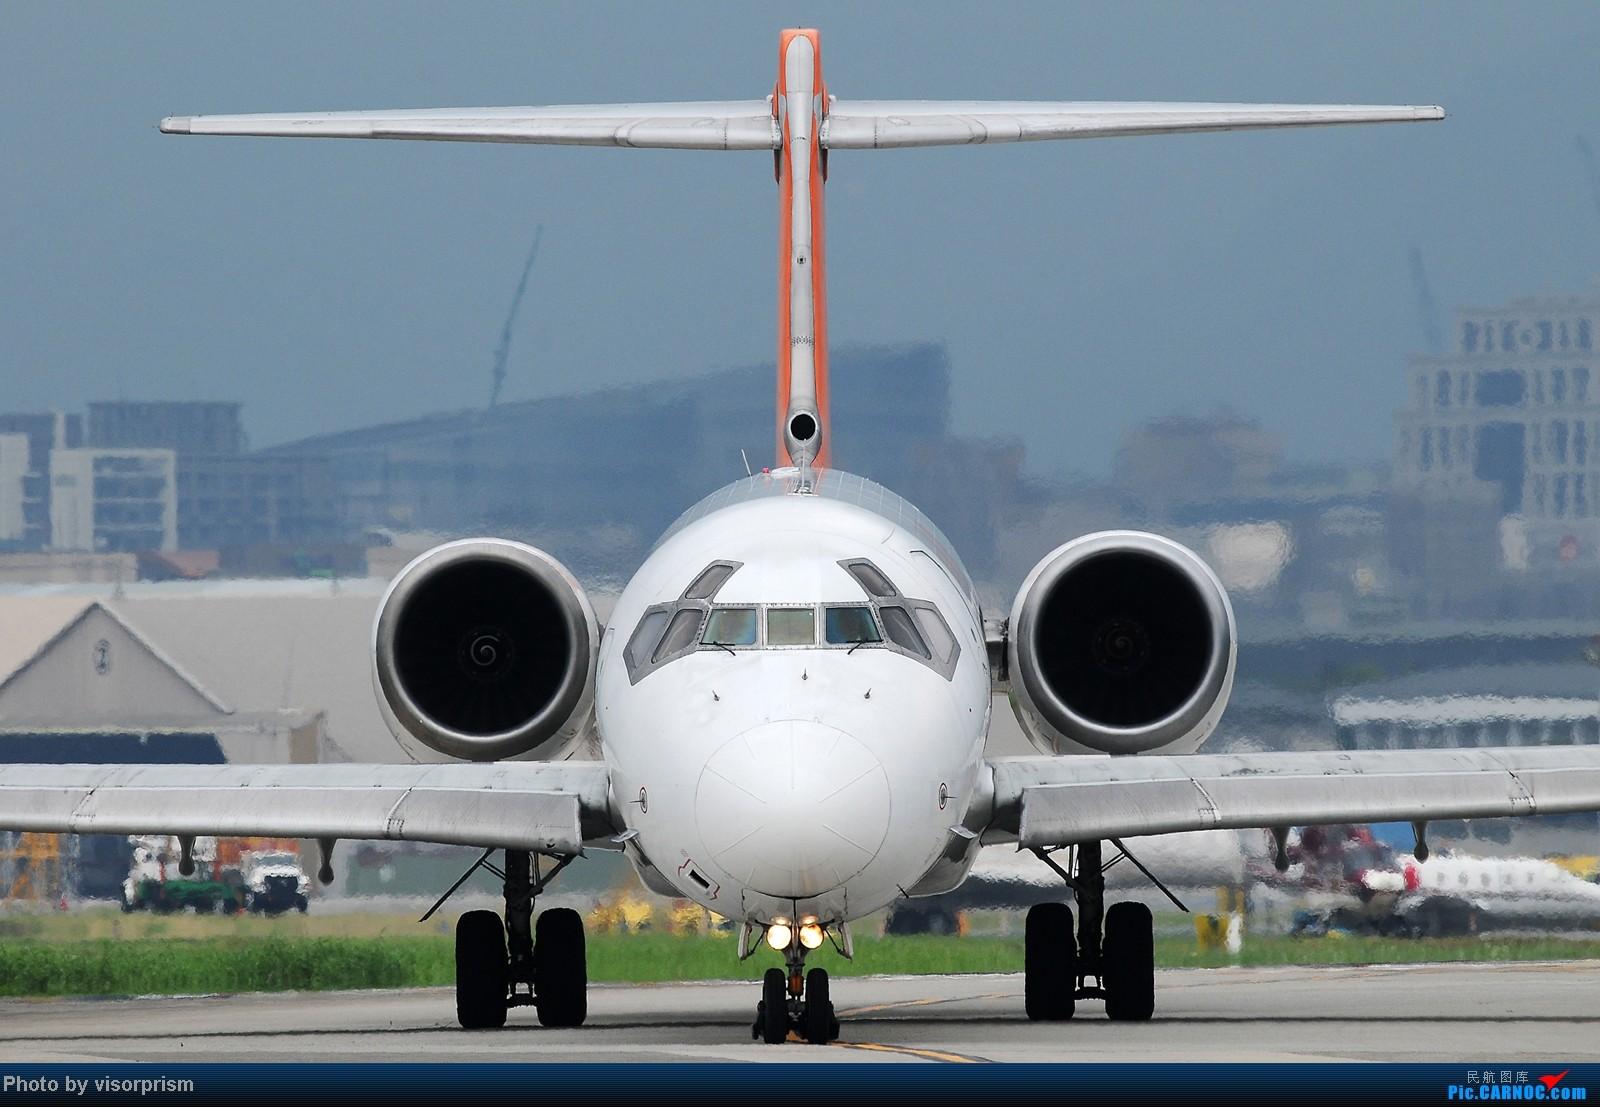 Re:[原创][台北飛友會]SIGMA APO 500mm F4.5 DG HSM 鏡頭測試 MCDONNELL DOUGLAS MD-90-30 B-17922 中国台北松山机场